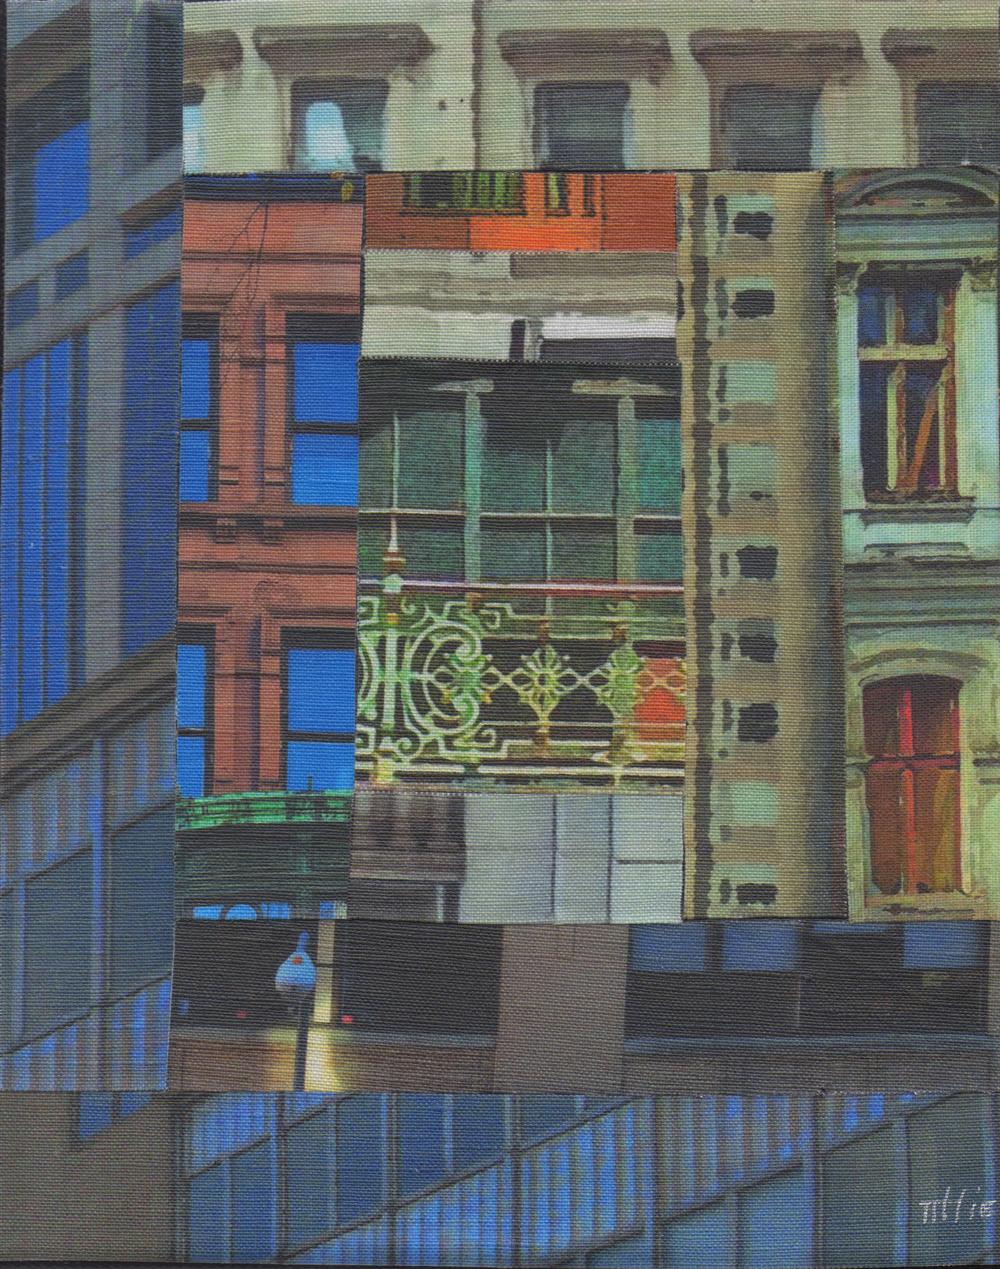 patchwork city 38